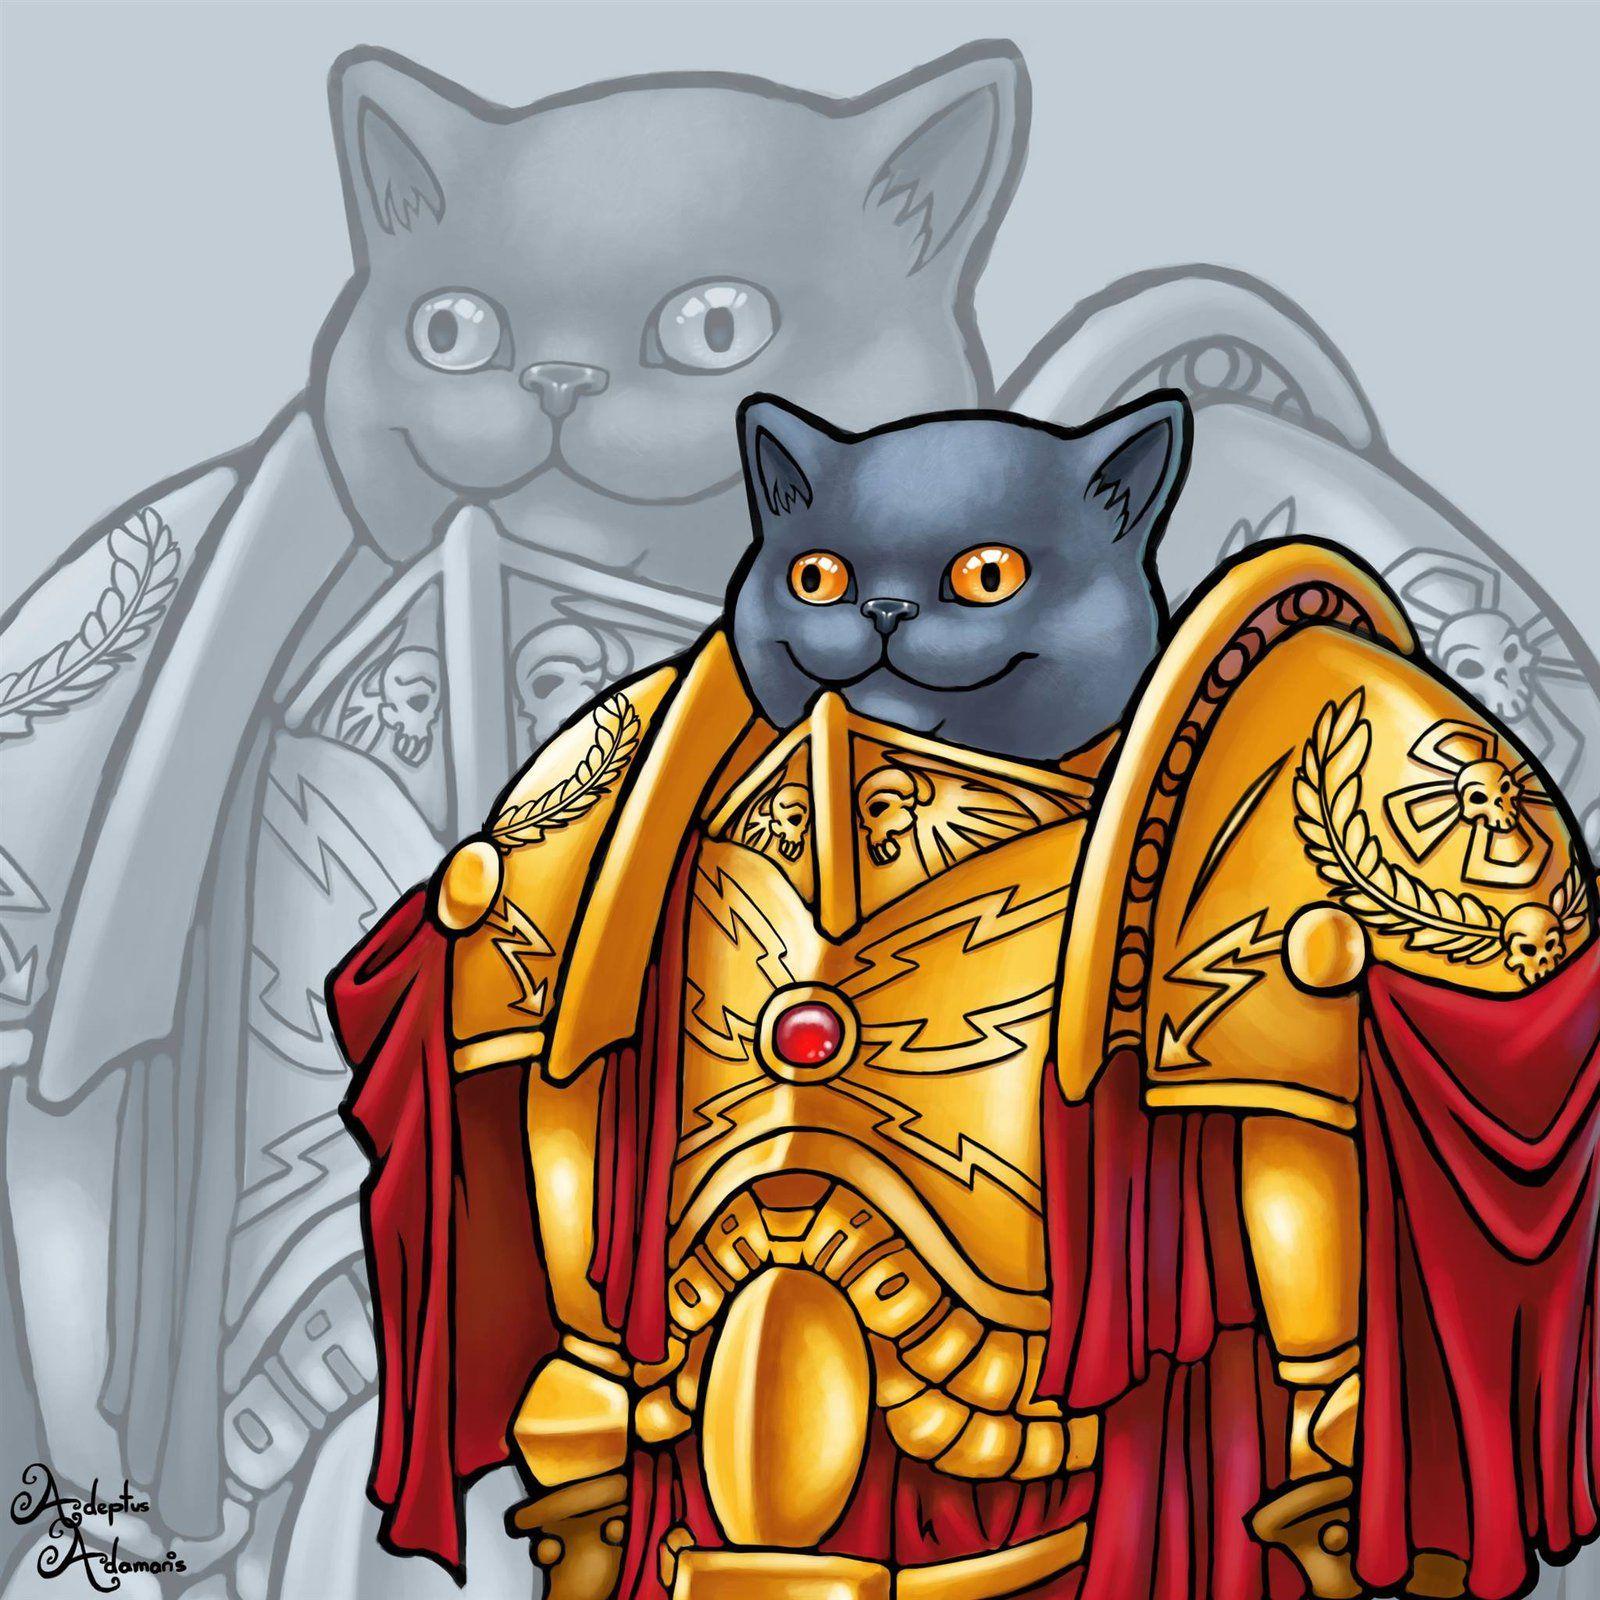 14831016131650 Jpg 1600 1600 Warhammer 40k Artwork Warhammer Art Warhammer 40k Memes